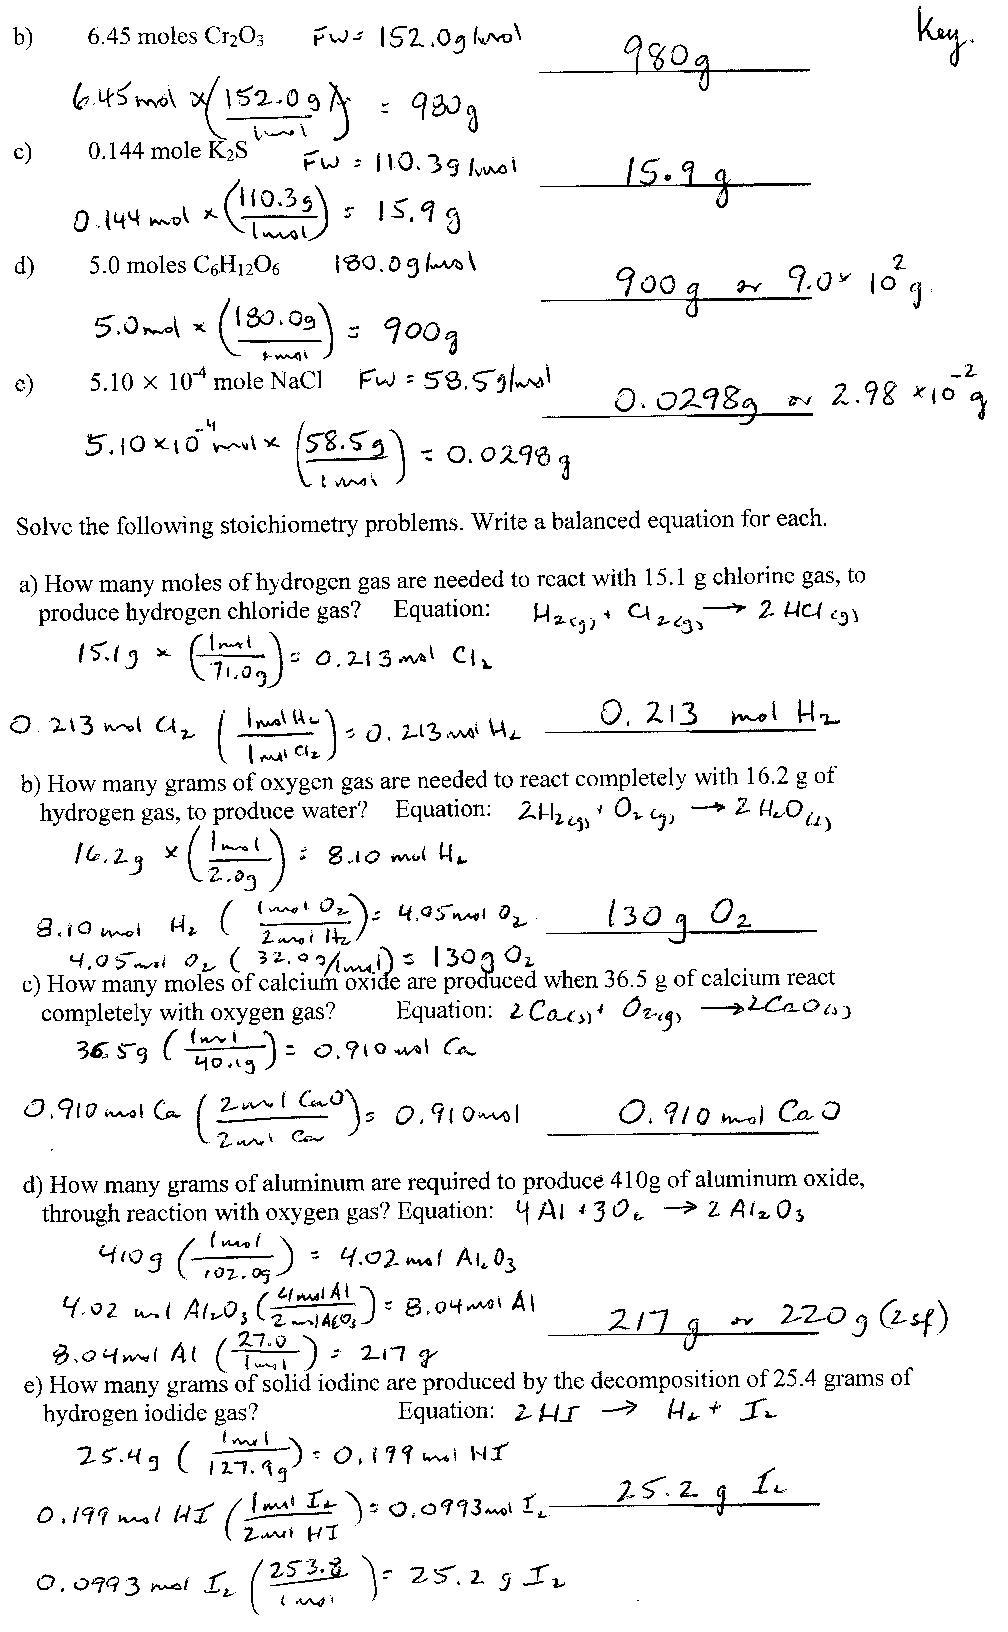 Chemistry Stoichiometry Worksheet The Best Worksheets Image